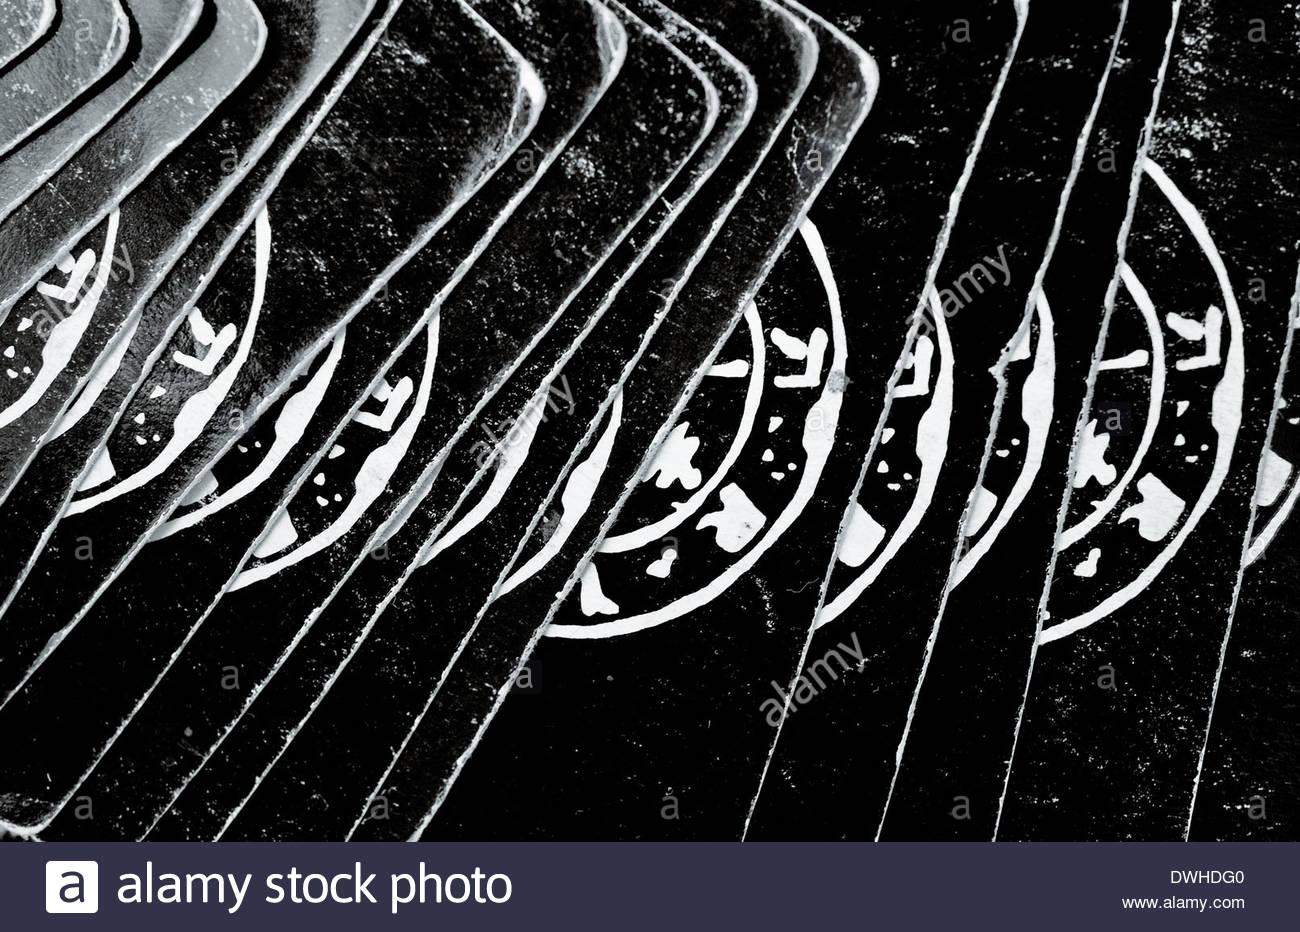 Close up detail of a deck of Tarot cards, Bangkok, Thailand, South East Asia. - Stock Image